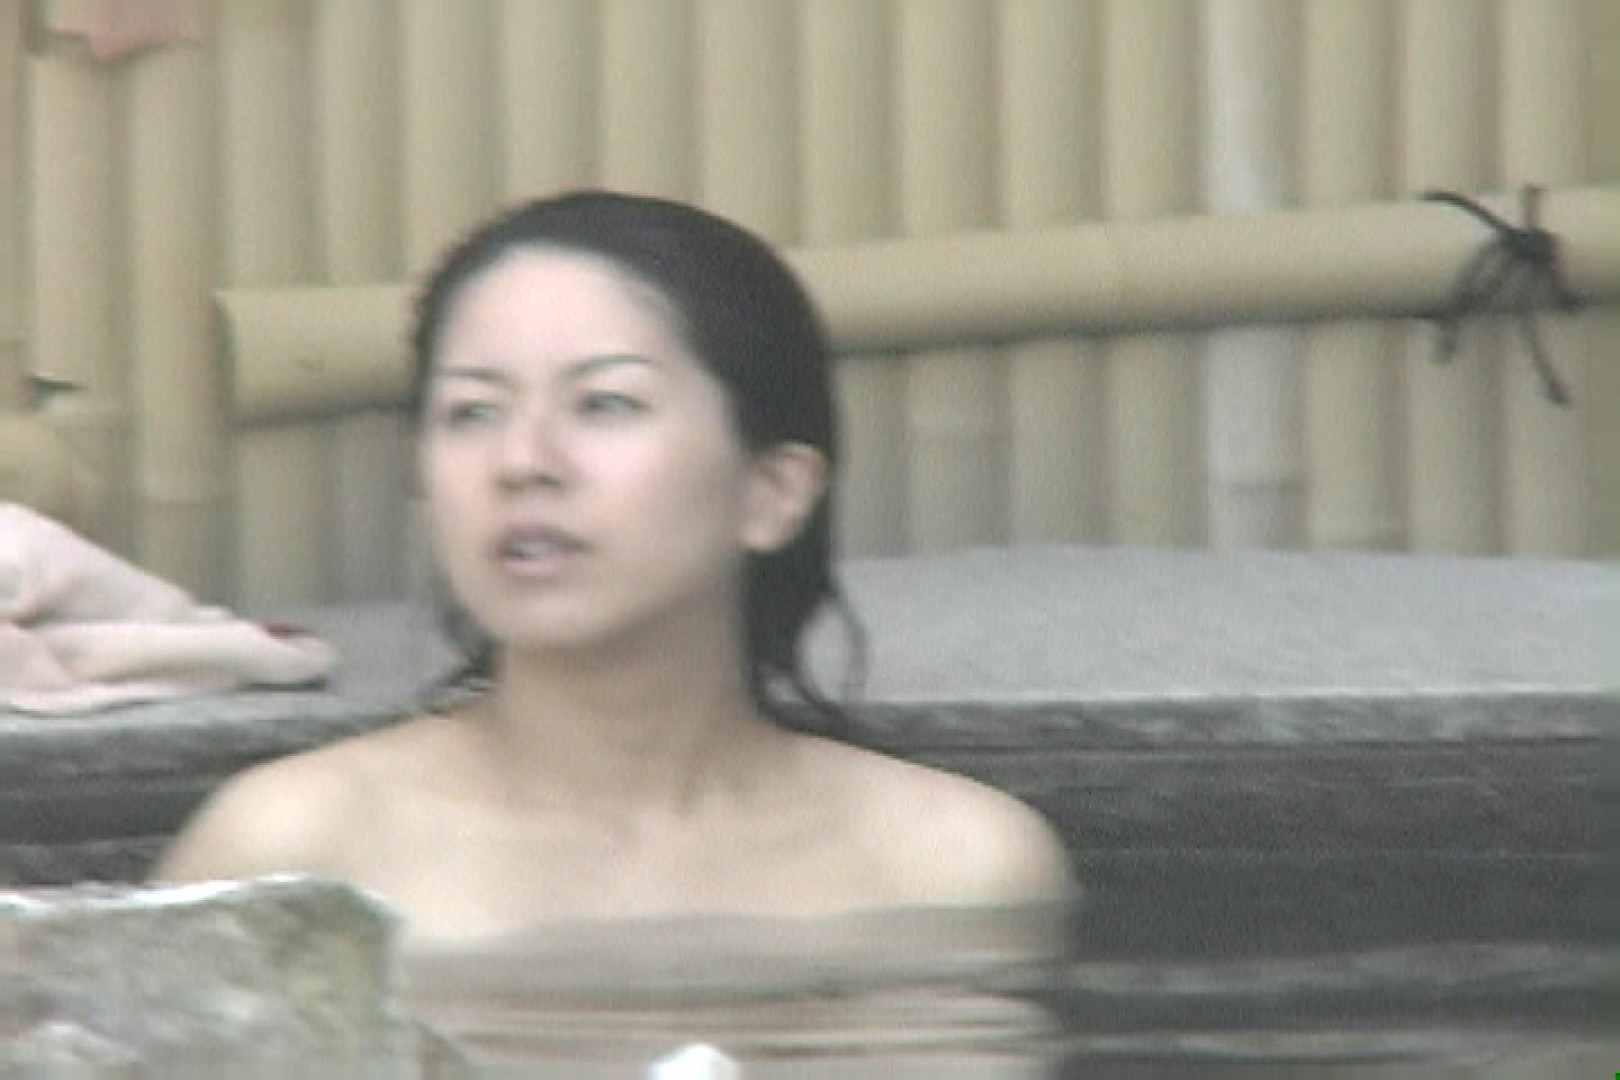 Aquaな露天風呂Vol.694 盗撮 | OLエロ画像  110PICs 4